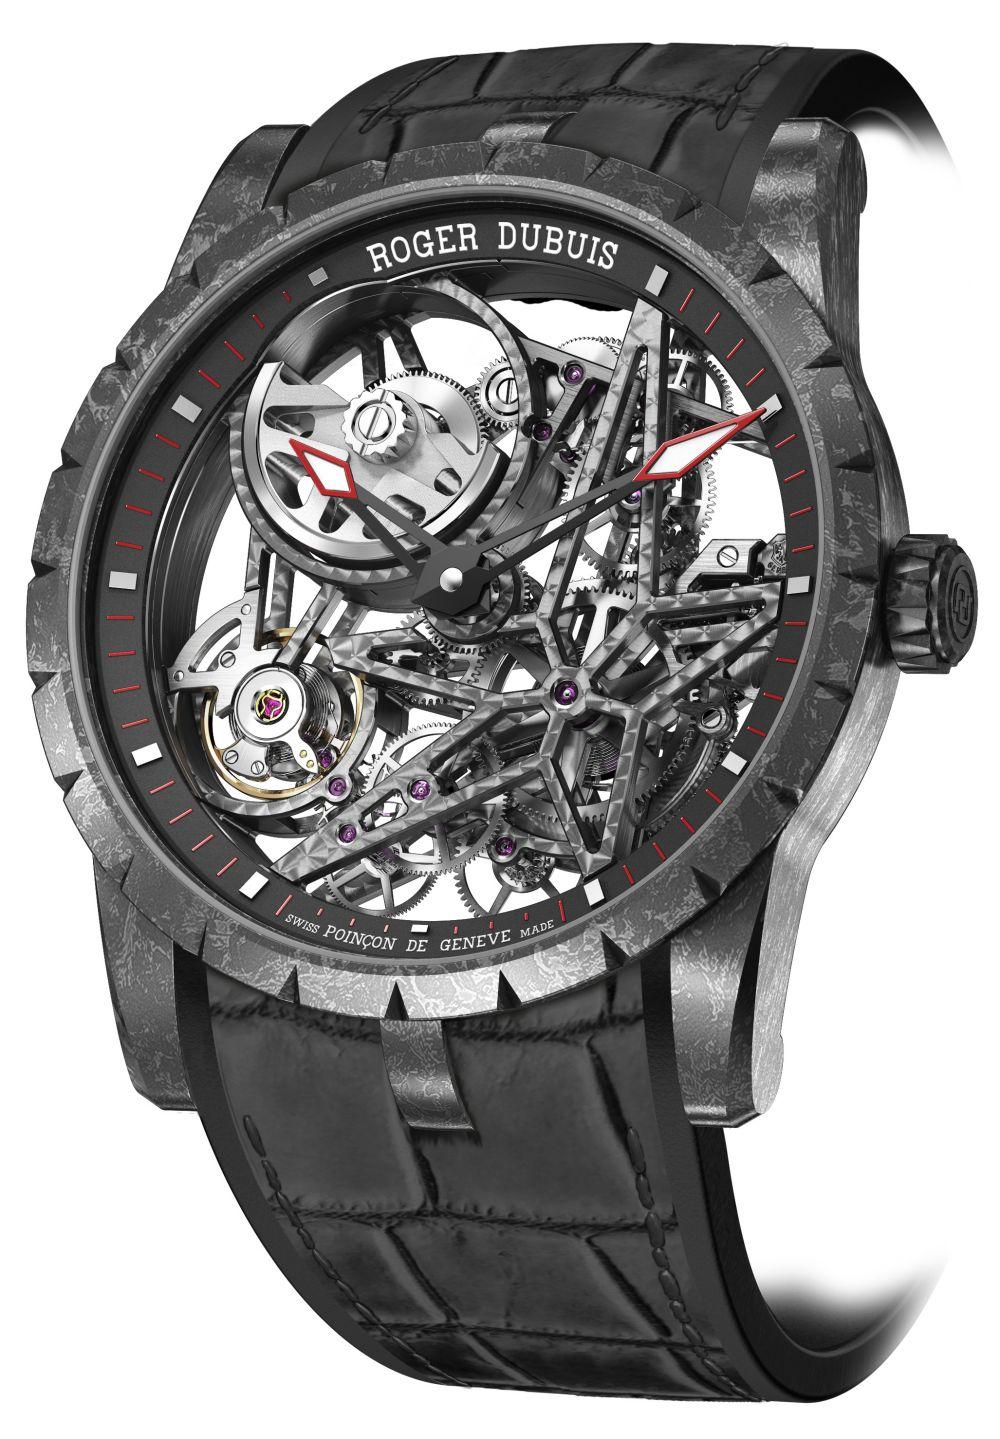 Roger-Dubuis-Excalibur-Automatic-Skeleton-Carbon-9.jpg